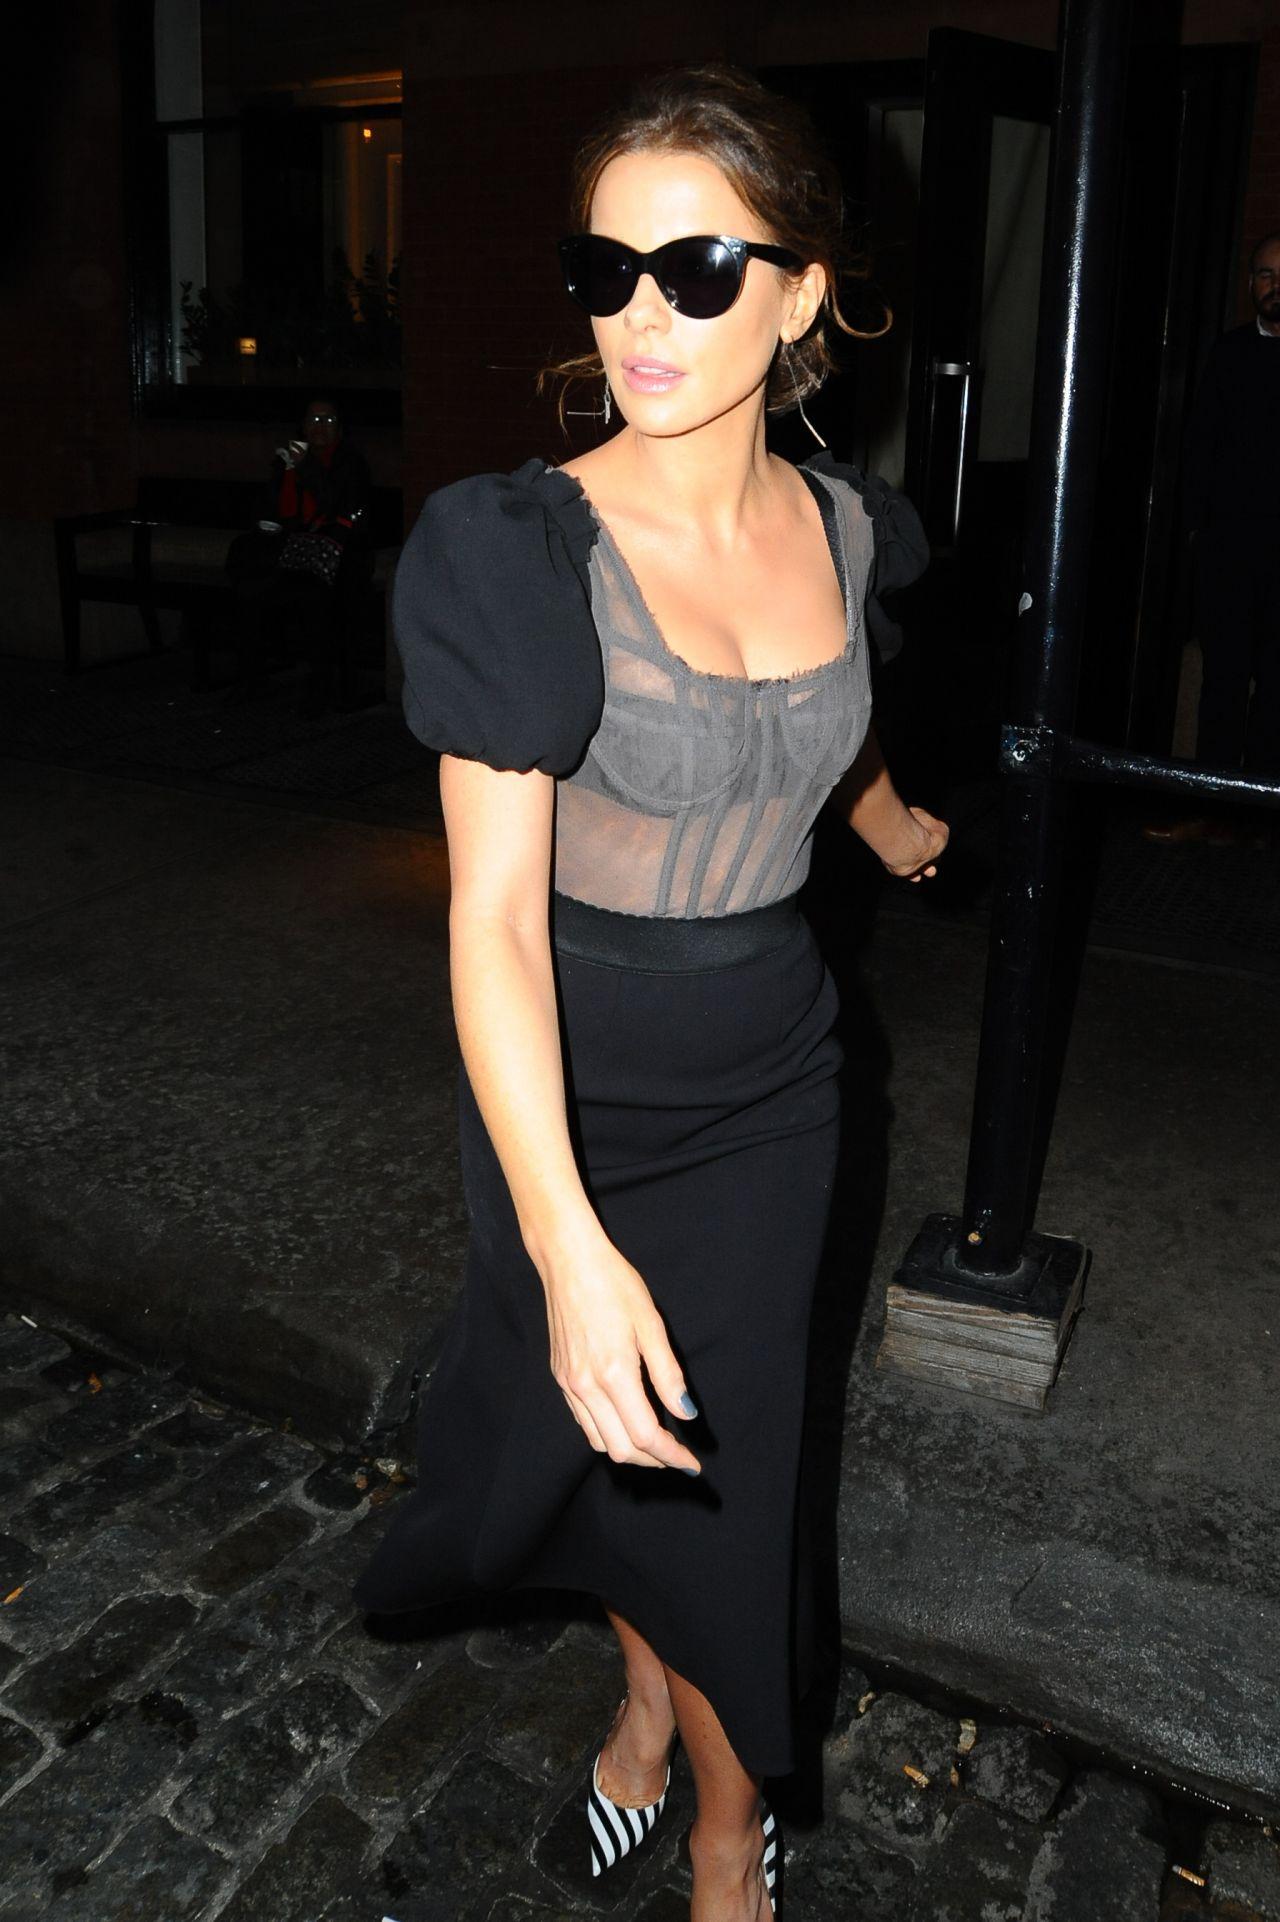 Kate Beckinsale Latest Photos - CelebMafia Kate Beckinsale